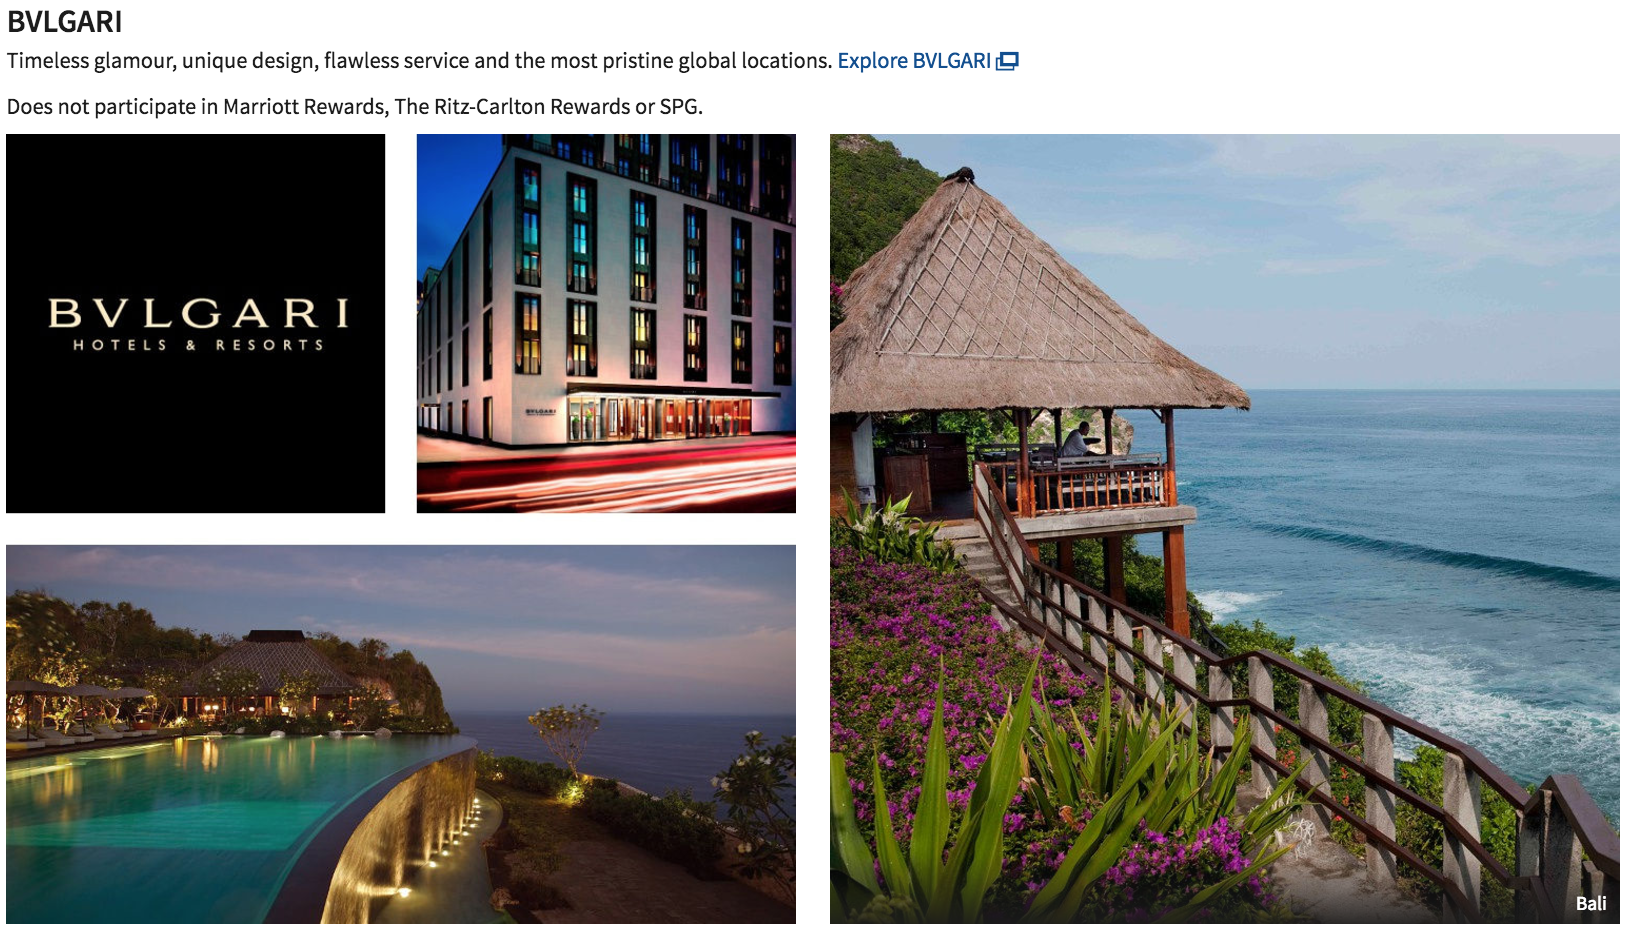 Bvlgari hotels are one of Marriott's luxury brands.